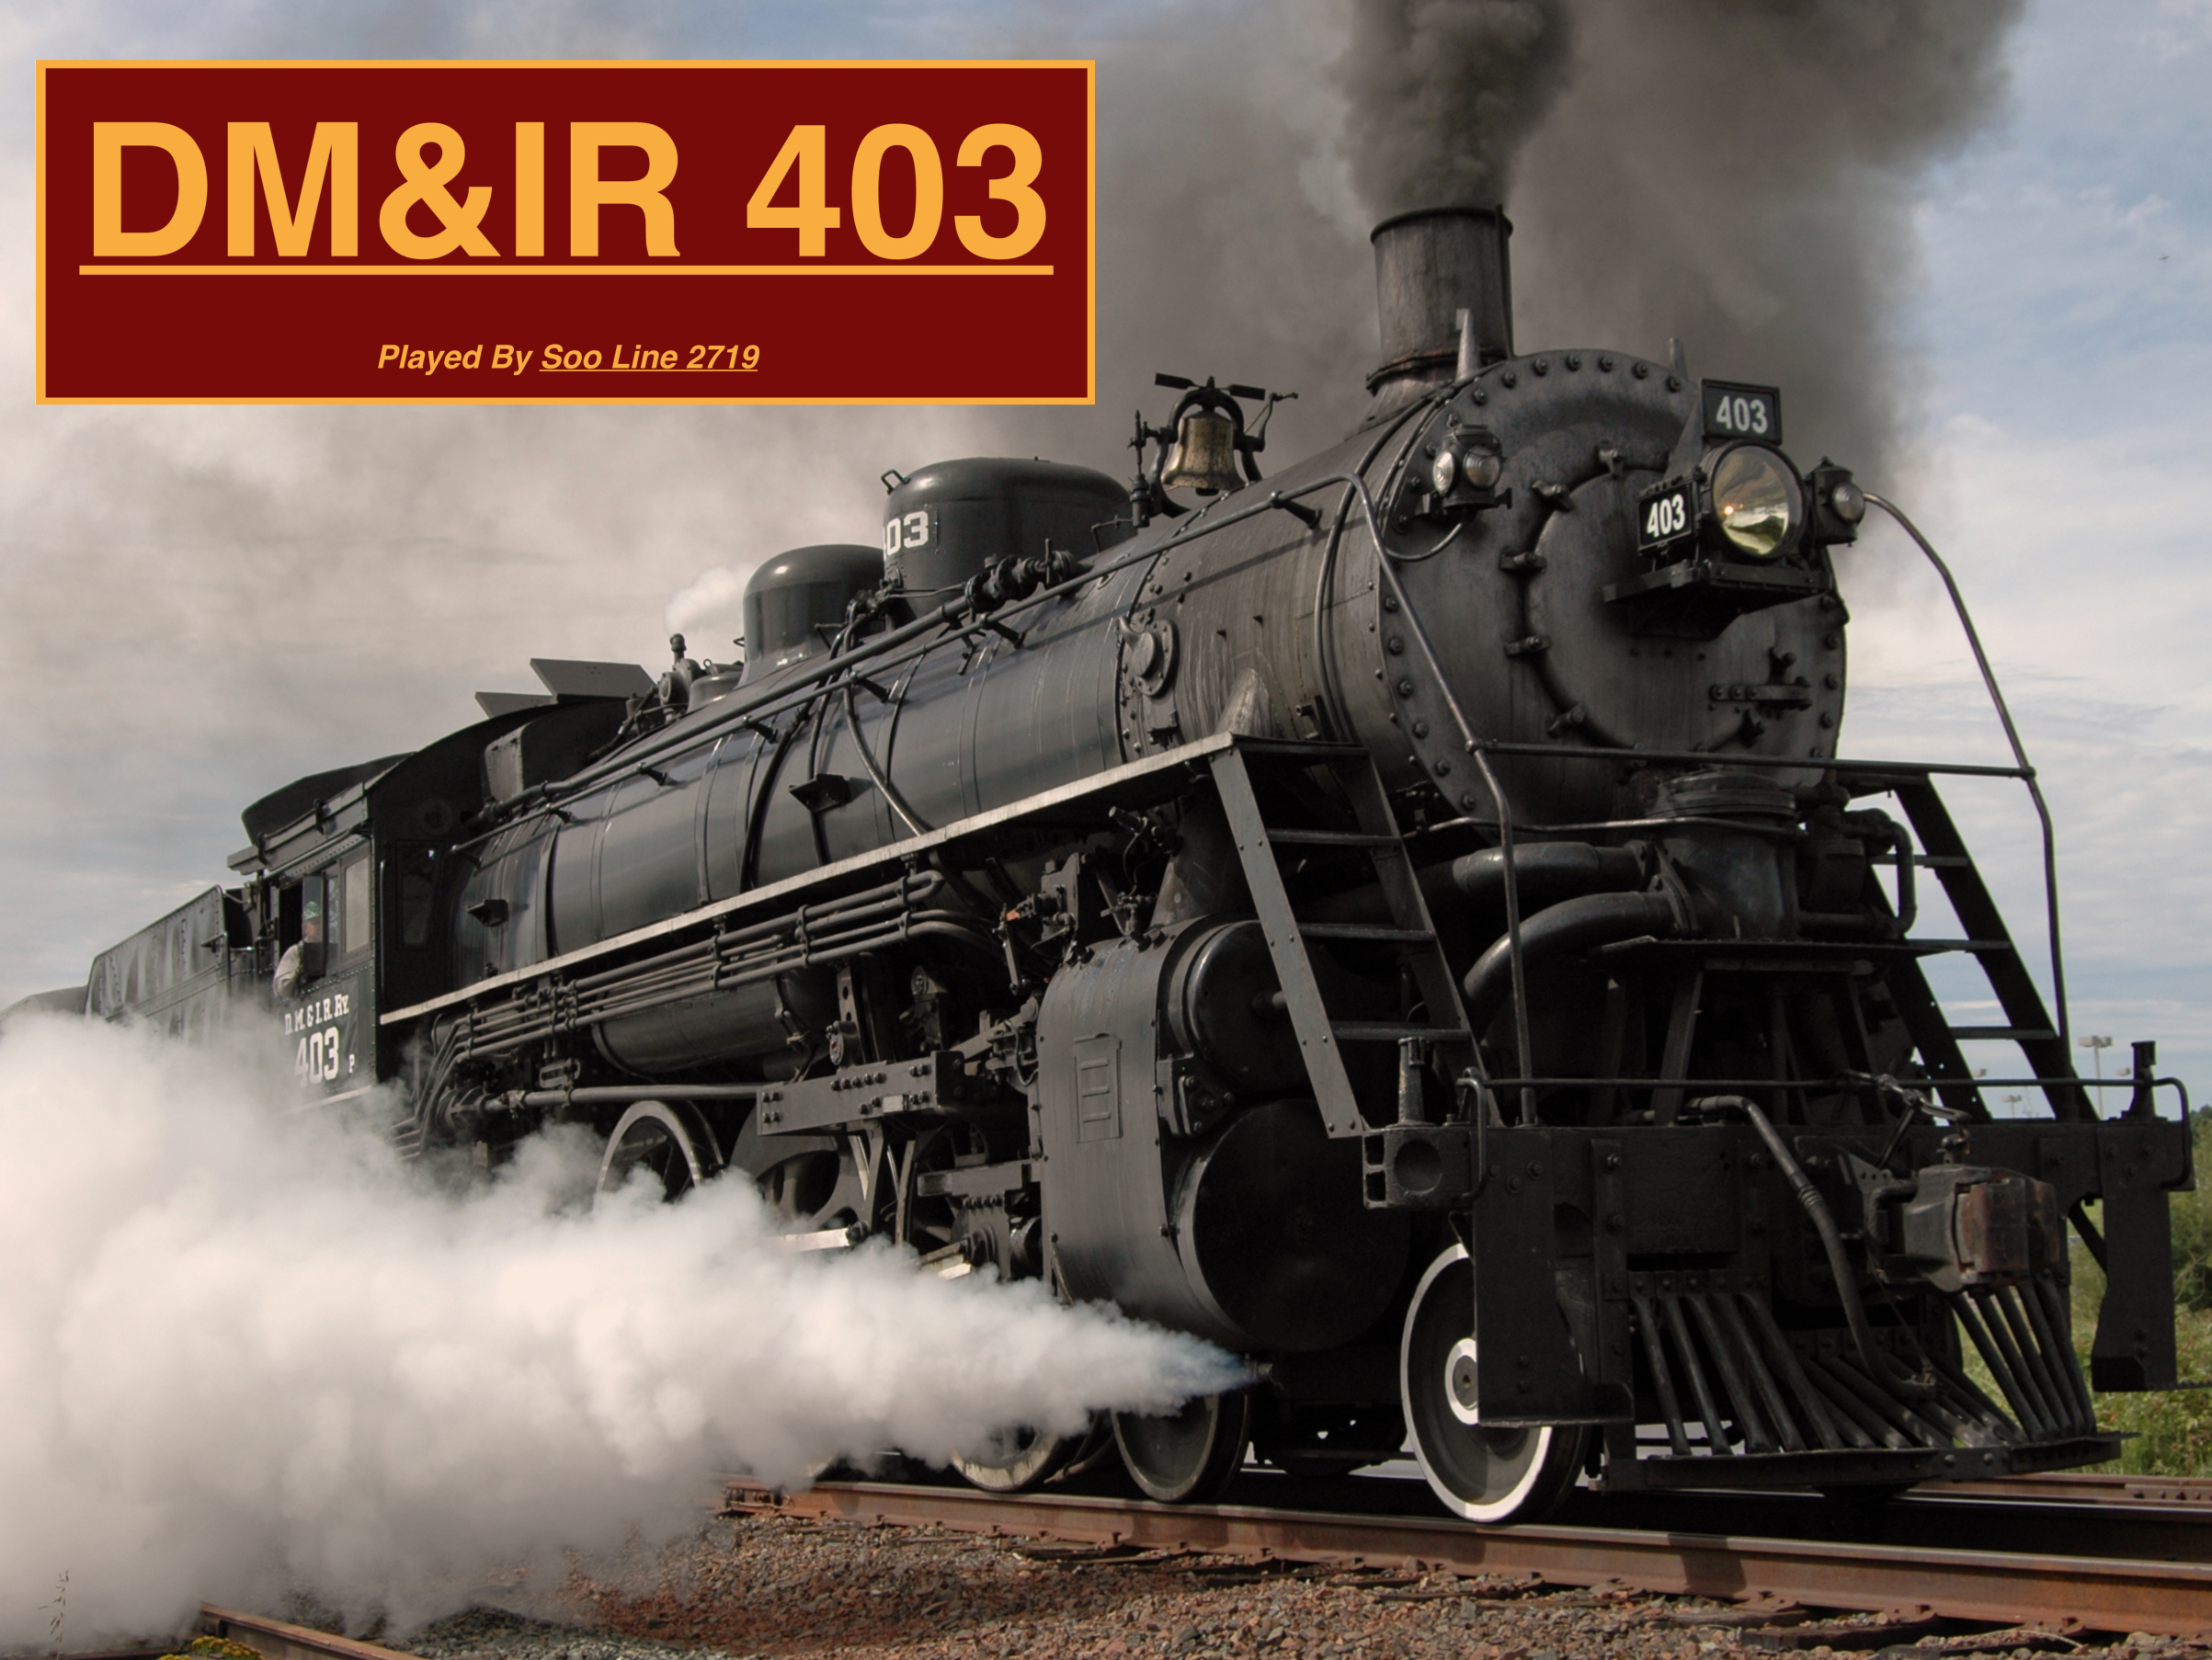 DM&IR 403 DMIR 403